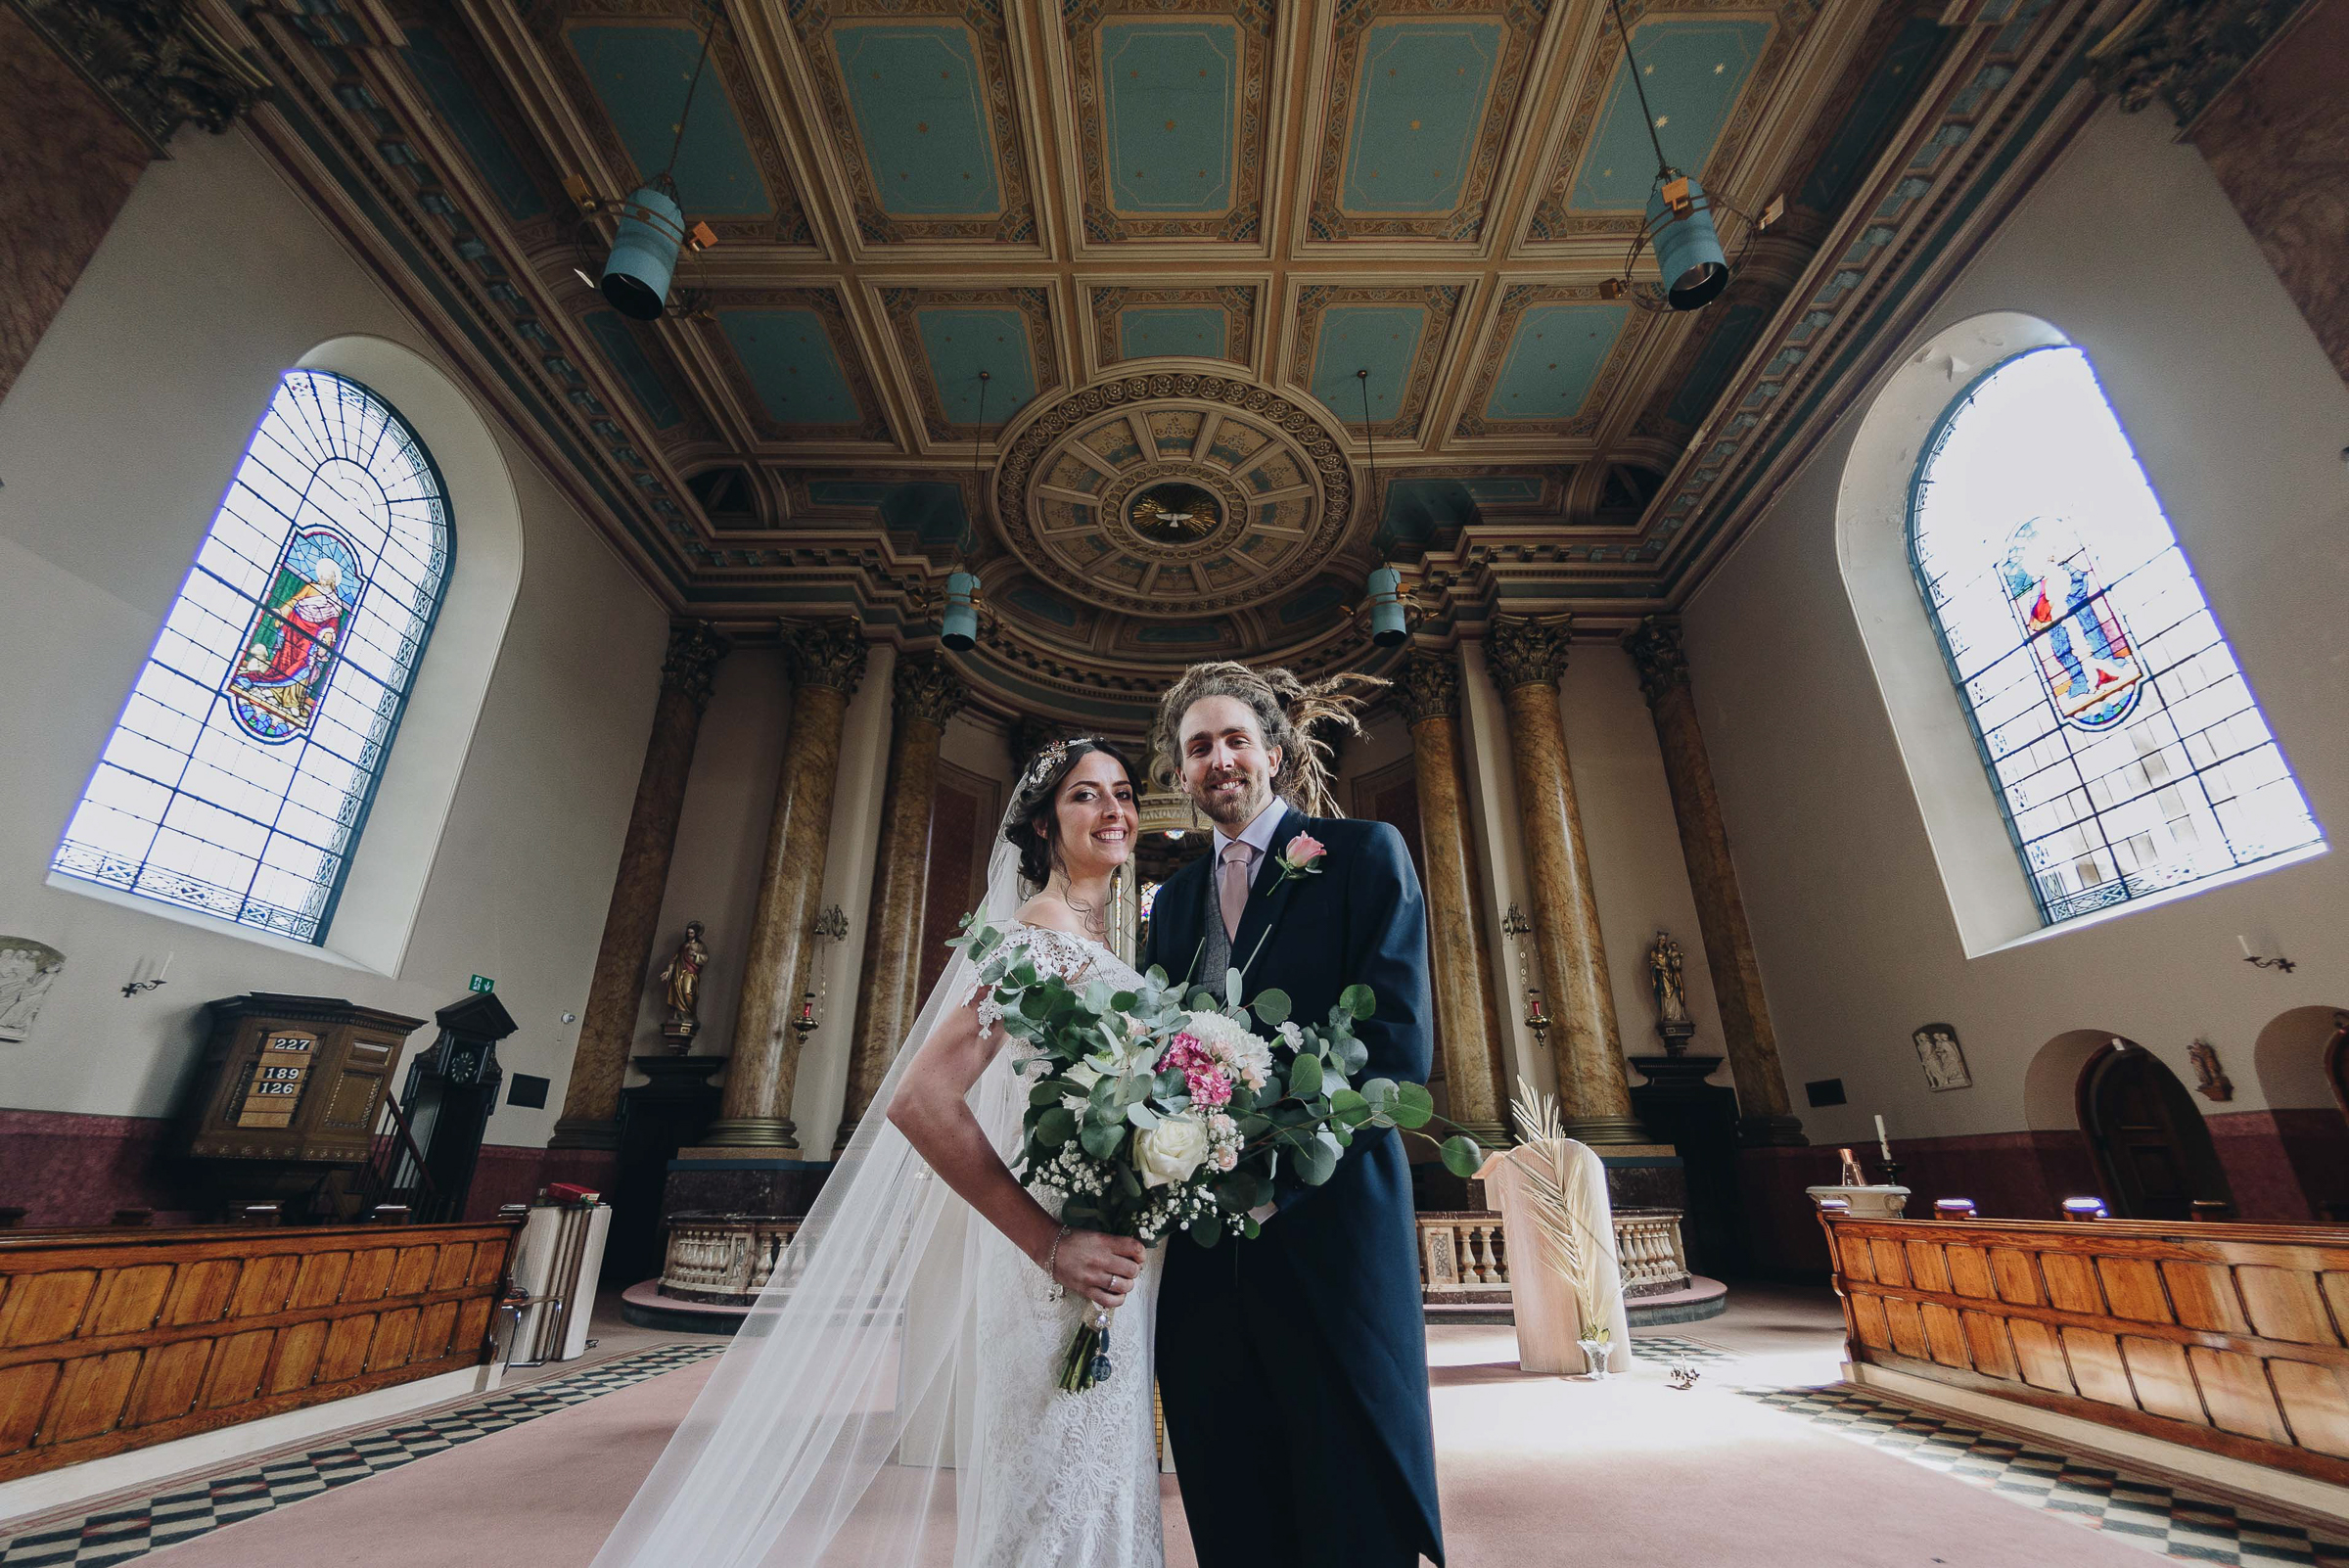 Rochdale-town-hall-vegan-harry-potter-wedding-photography-27.jpg